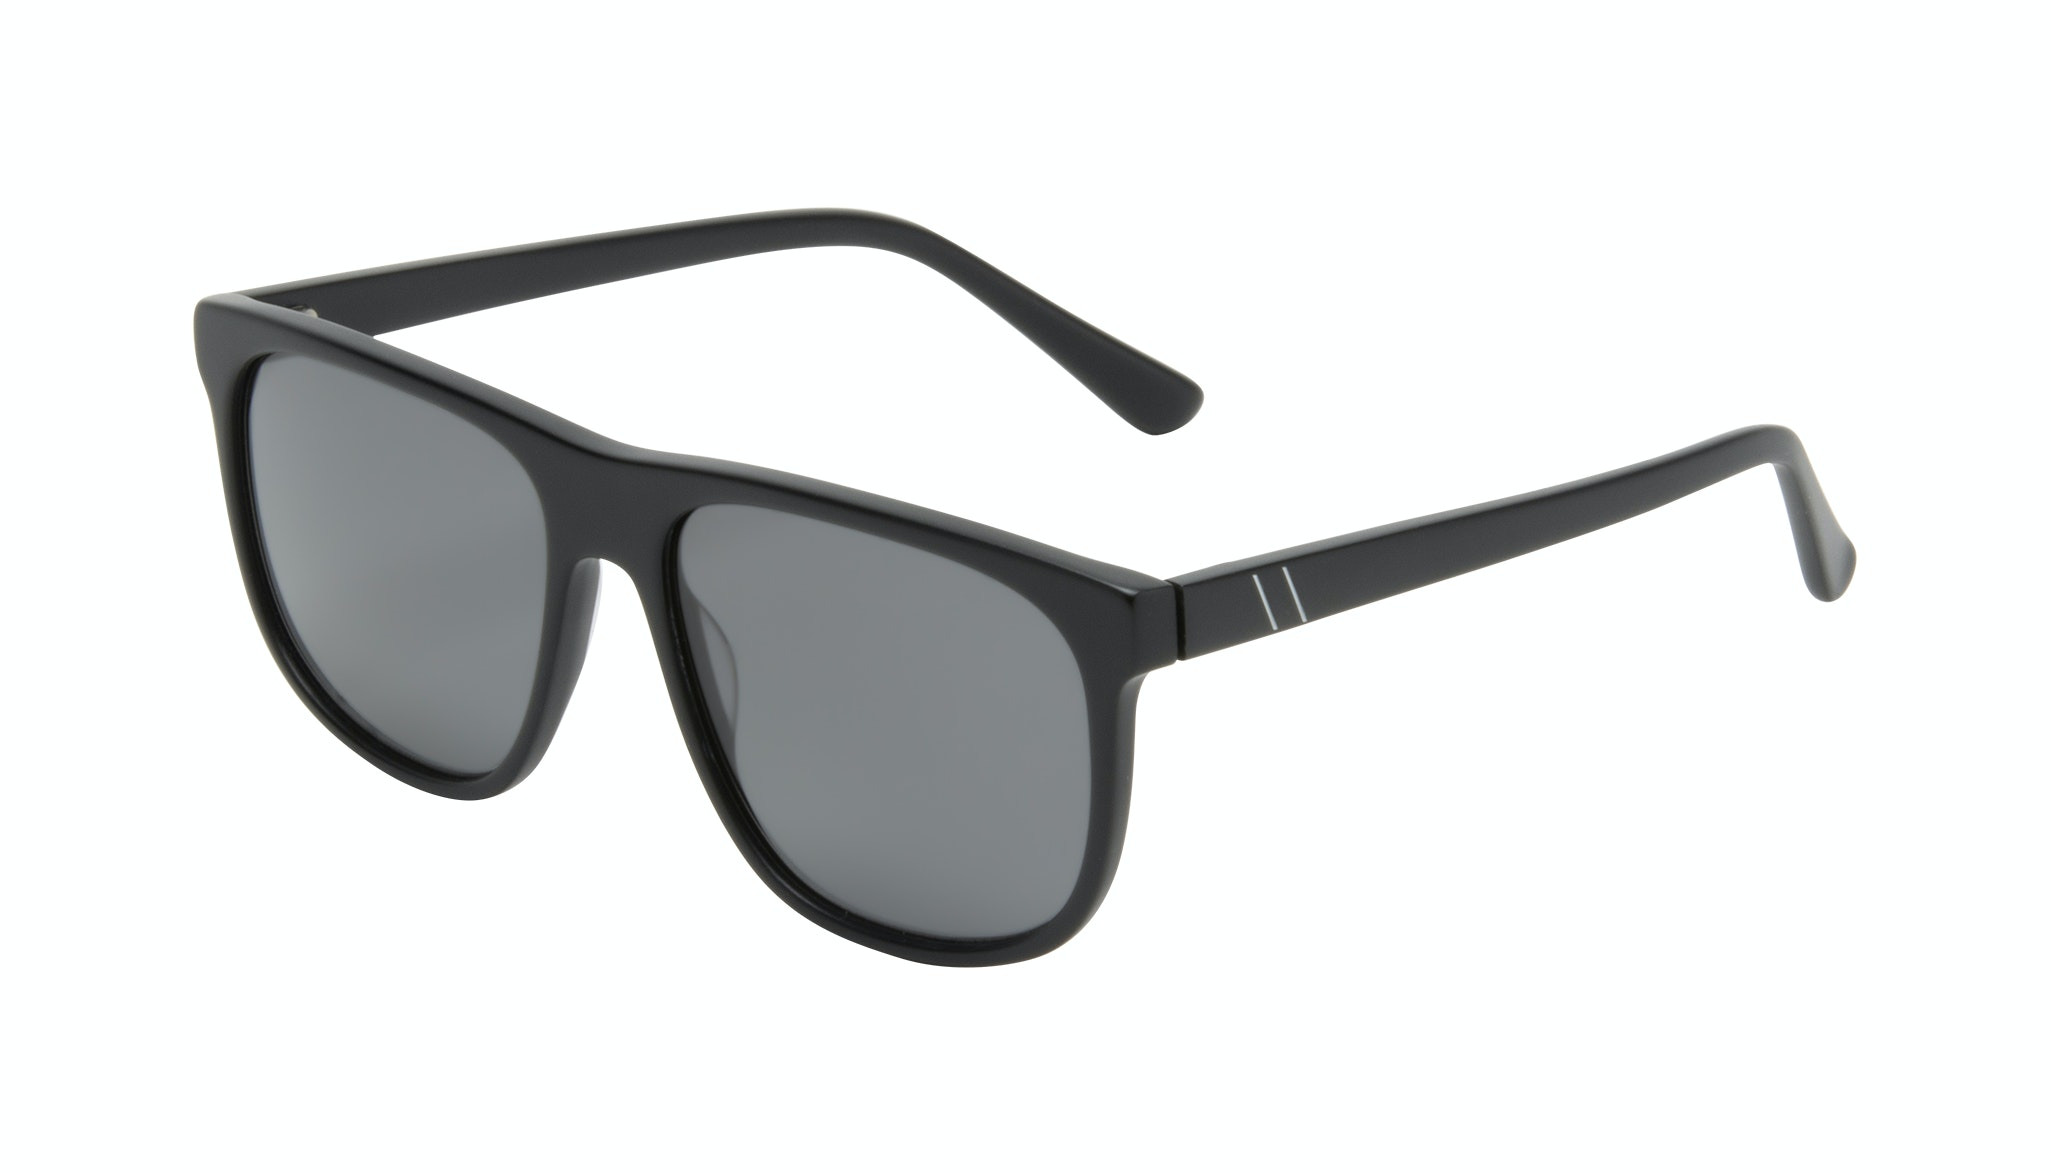 Affordable Fashion Glasses Square Sunglasses Men Rush Onyx Matte Tilt